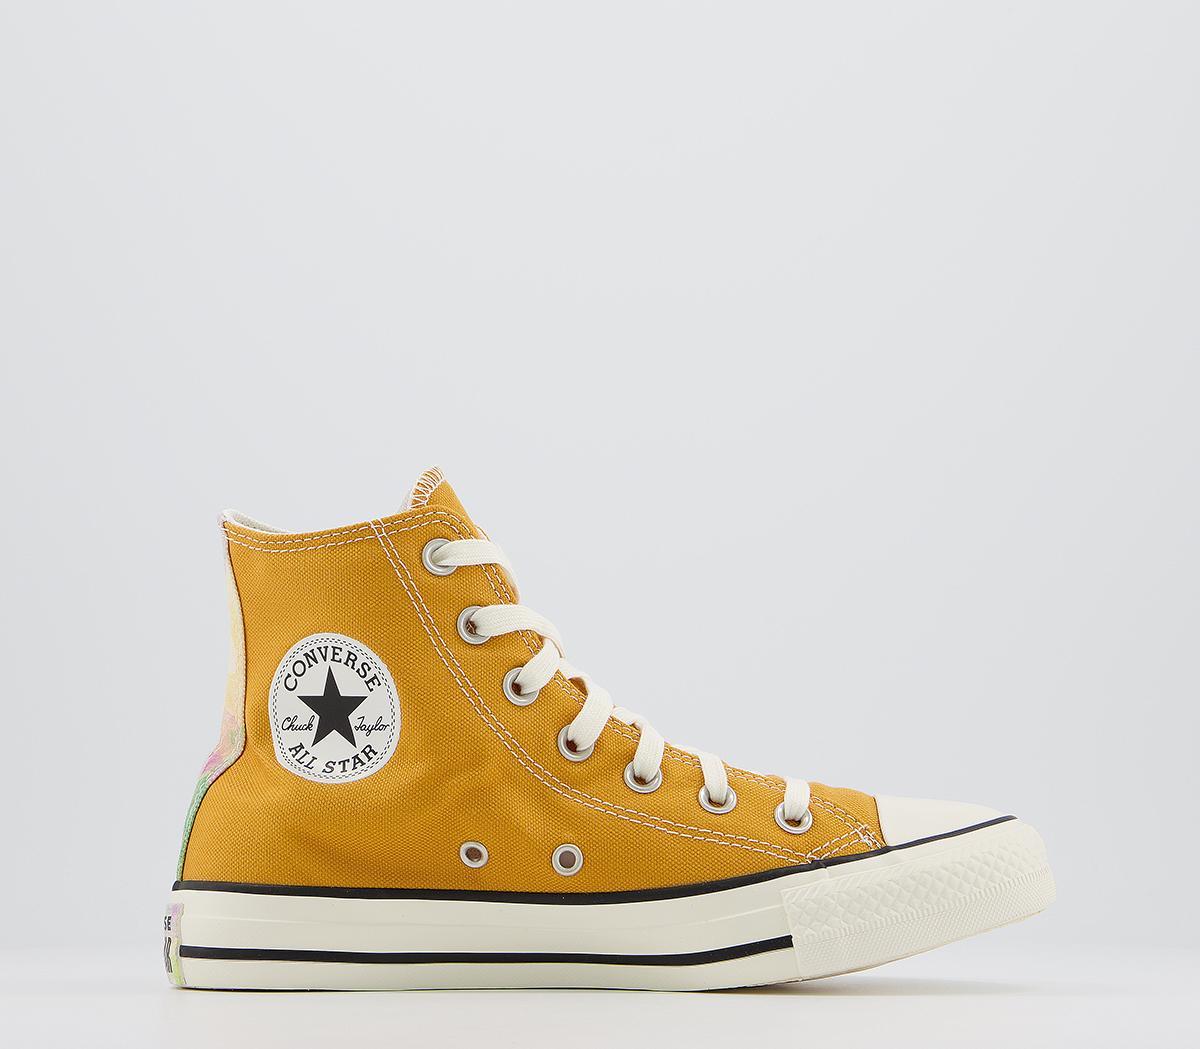 Converse Converse All Star Hi Trainers